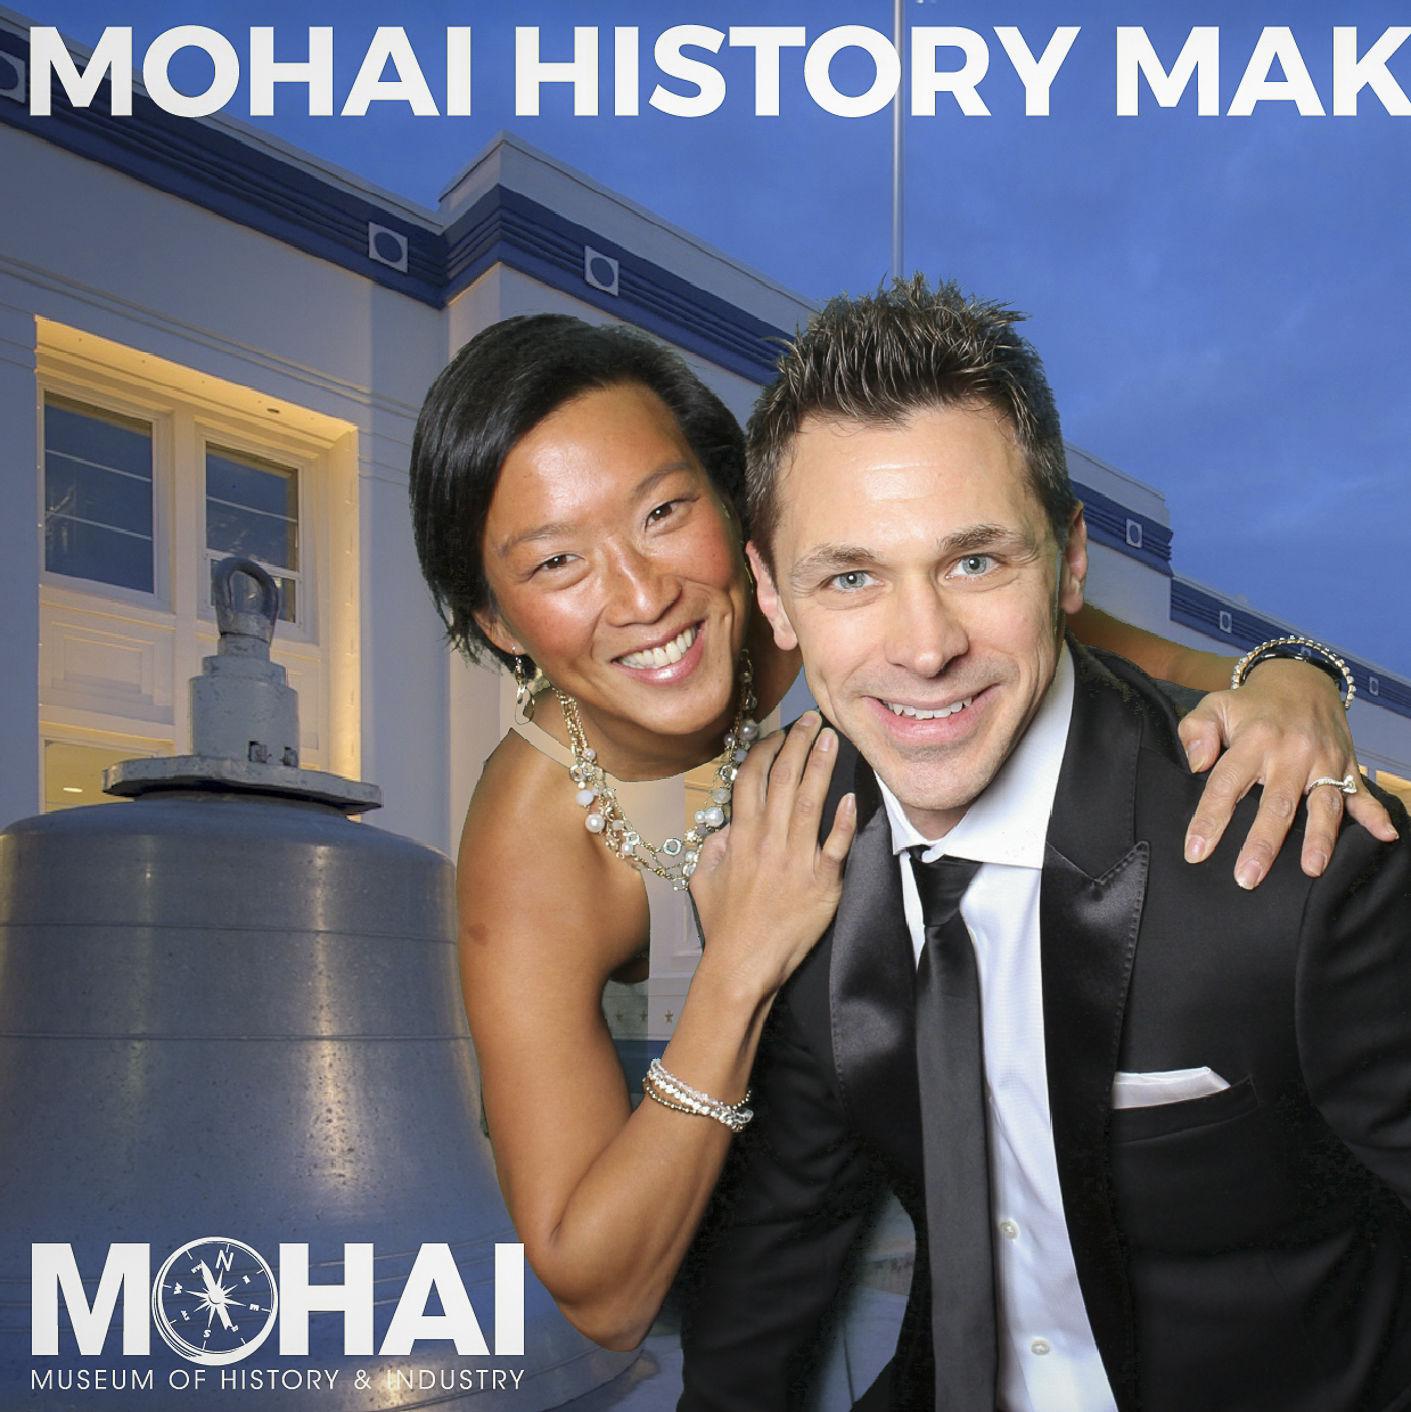 Mohai history maker  pv   63 of 95  wiv2eo